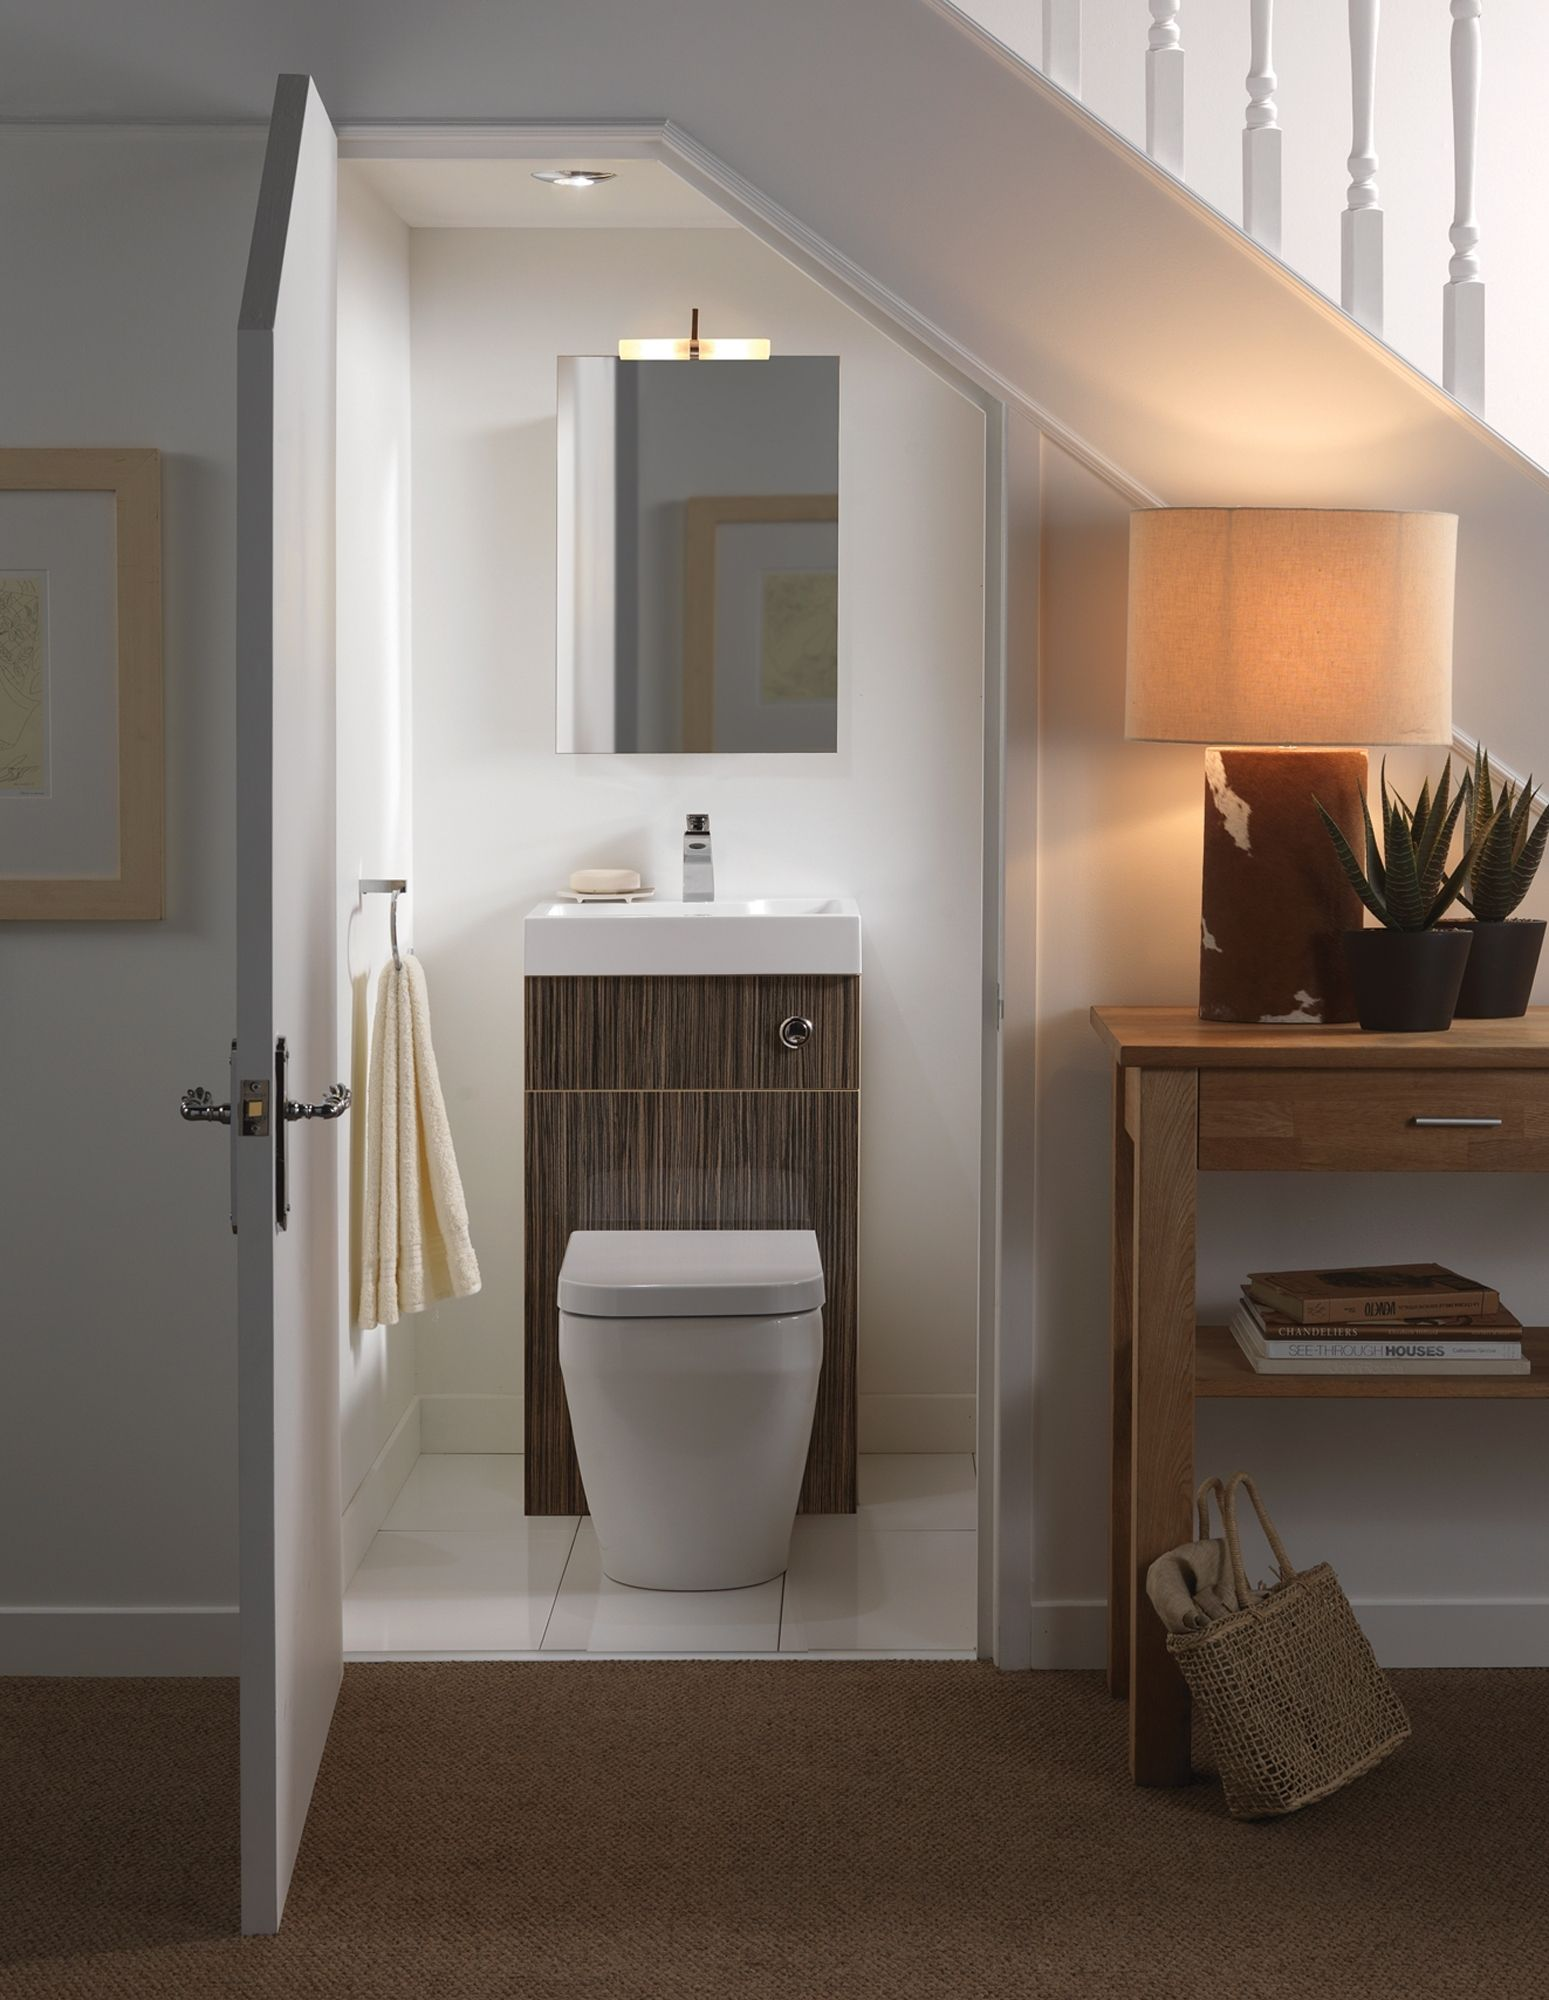 Basement Bathroom Ideas Plumbing Smallbasementbathroomideas Basement Bathroom Sump It Looks Grea Bathroom Under Stairs Small Bathroom Remodel Bathroom Layout